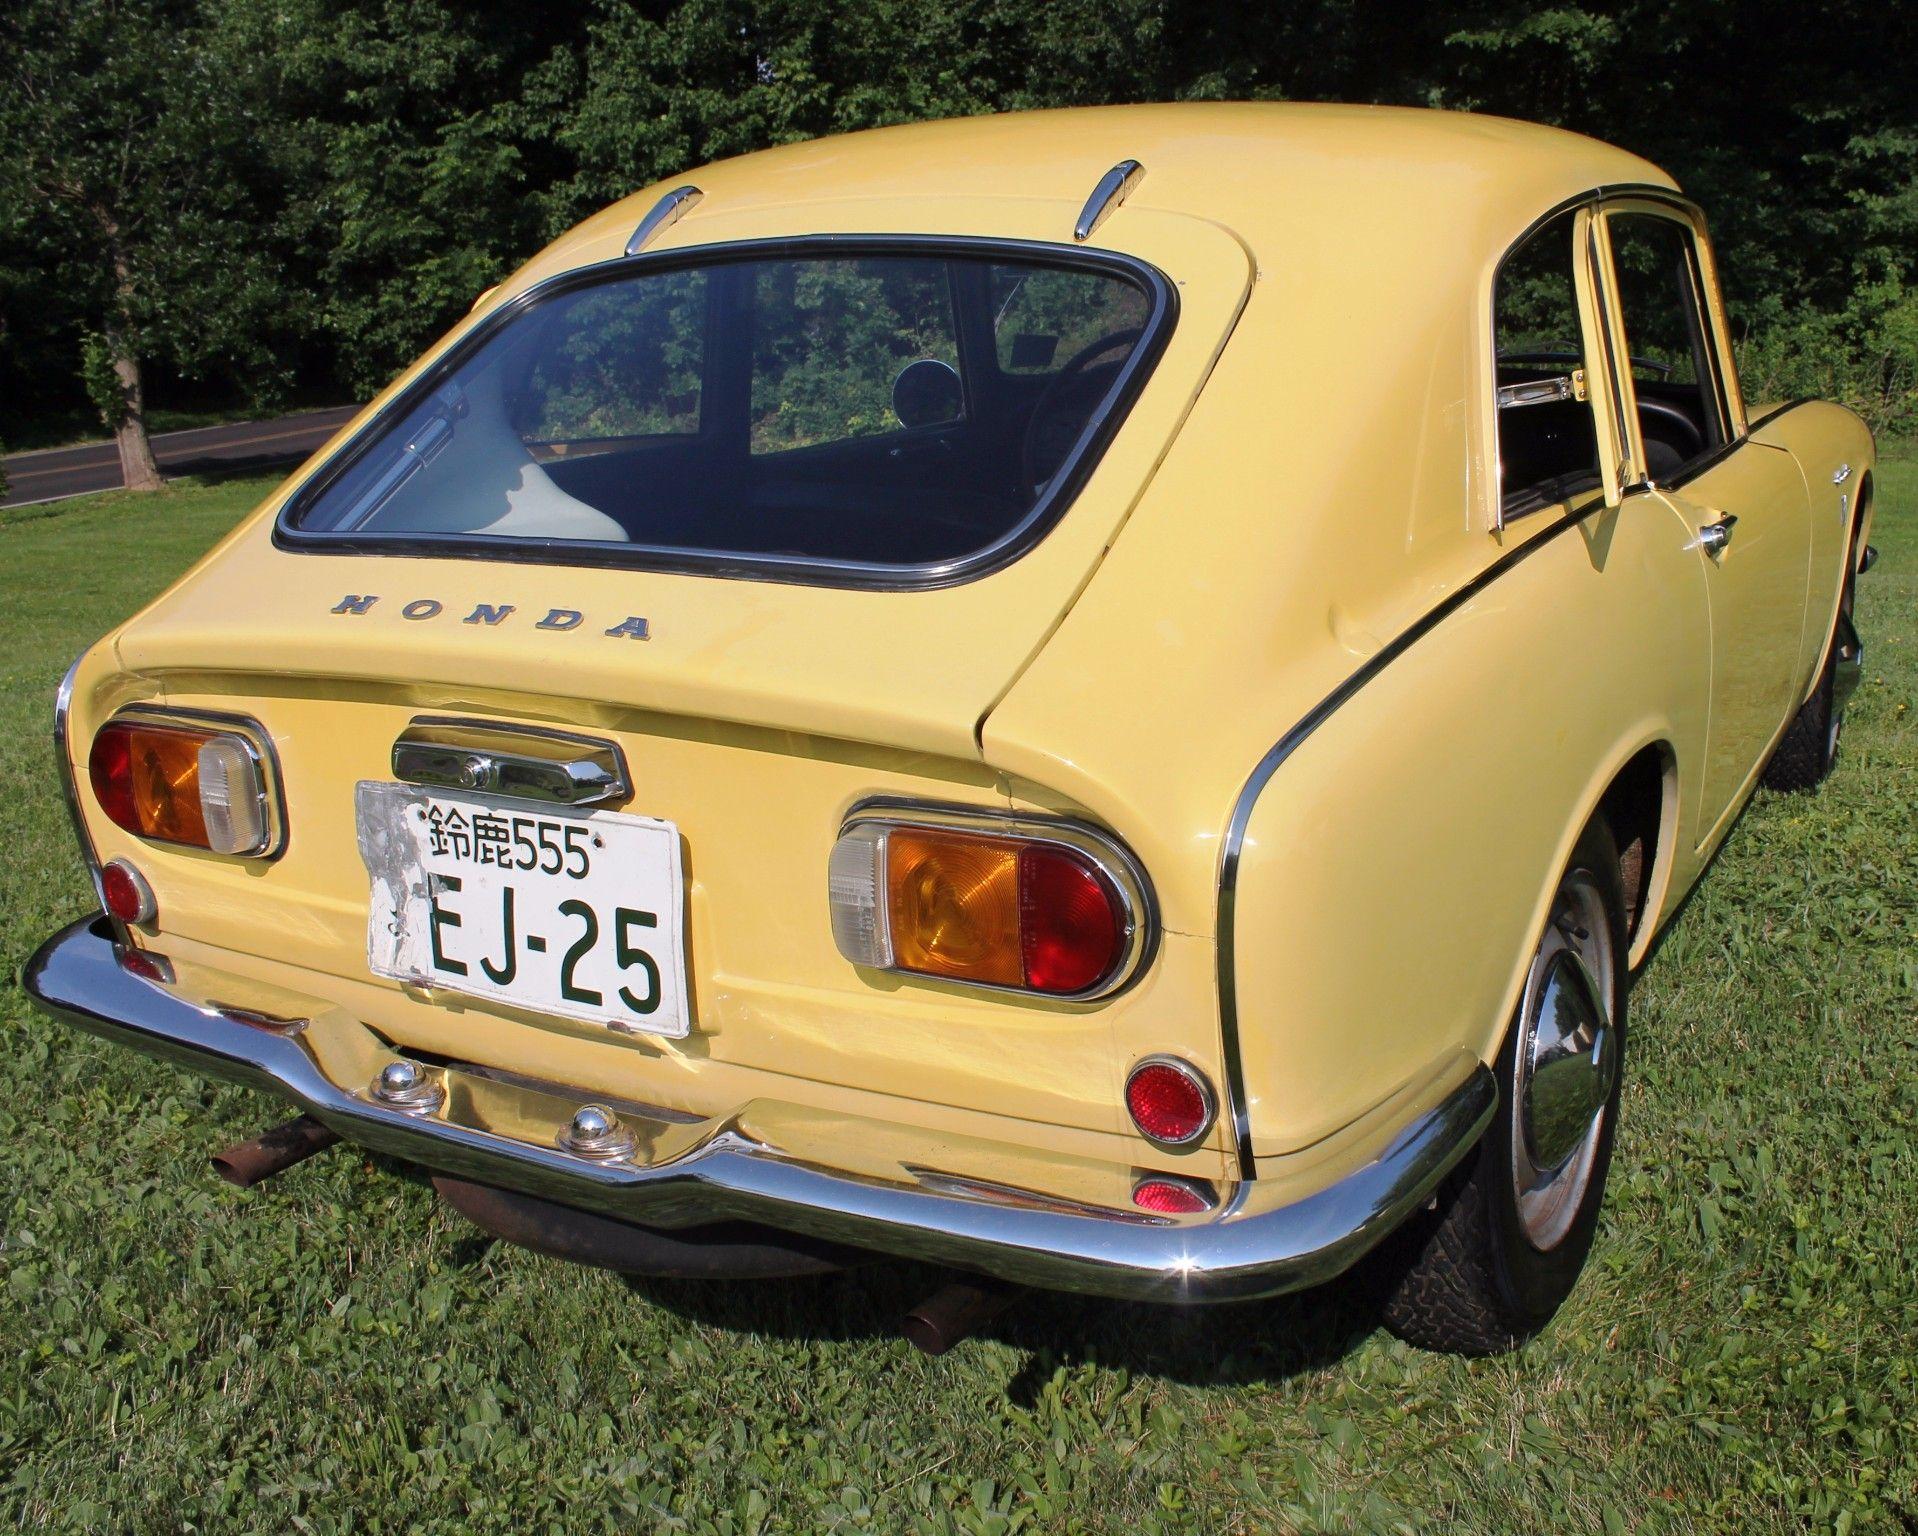 1970 Honda S800 Coupe | Honda, Classic cars, Japanese cars